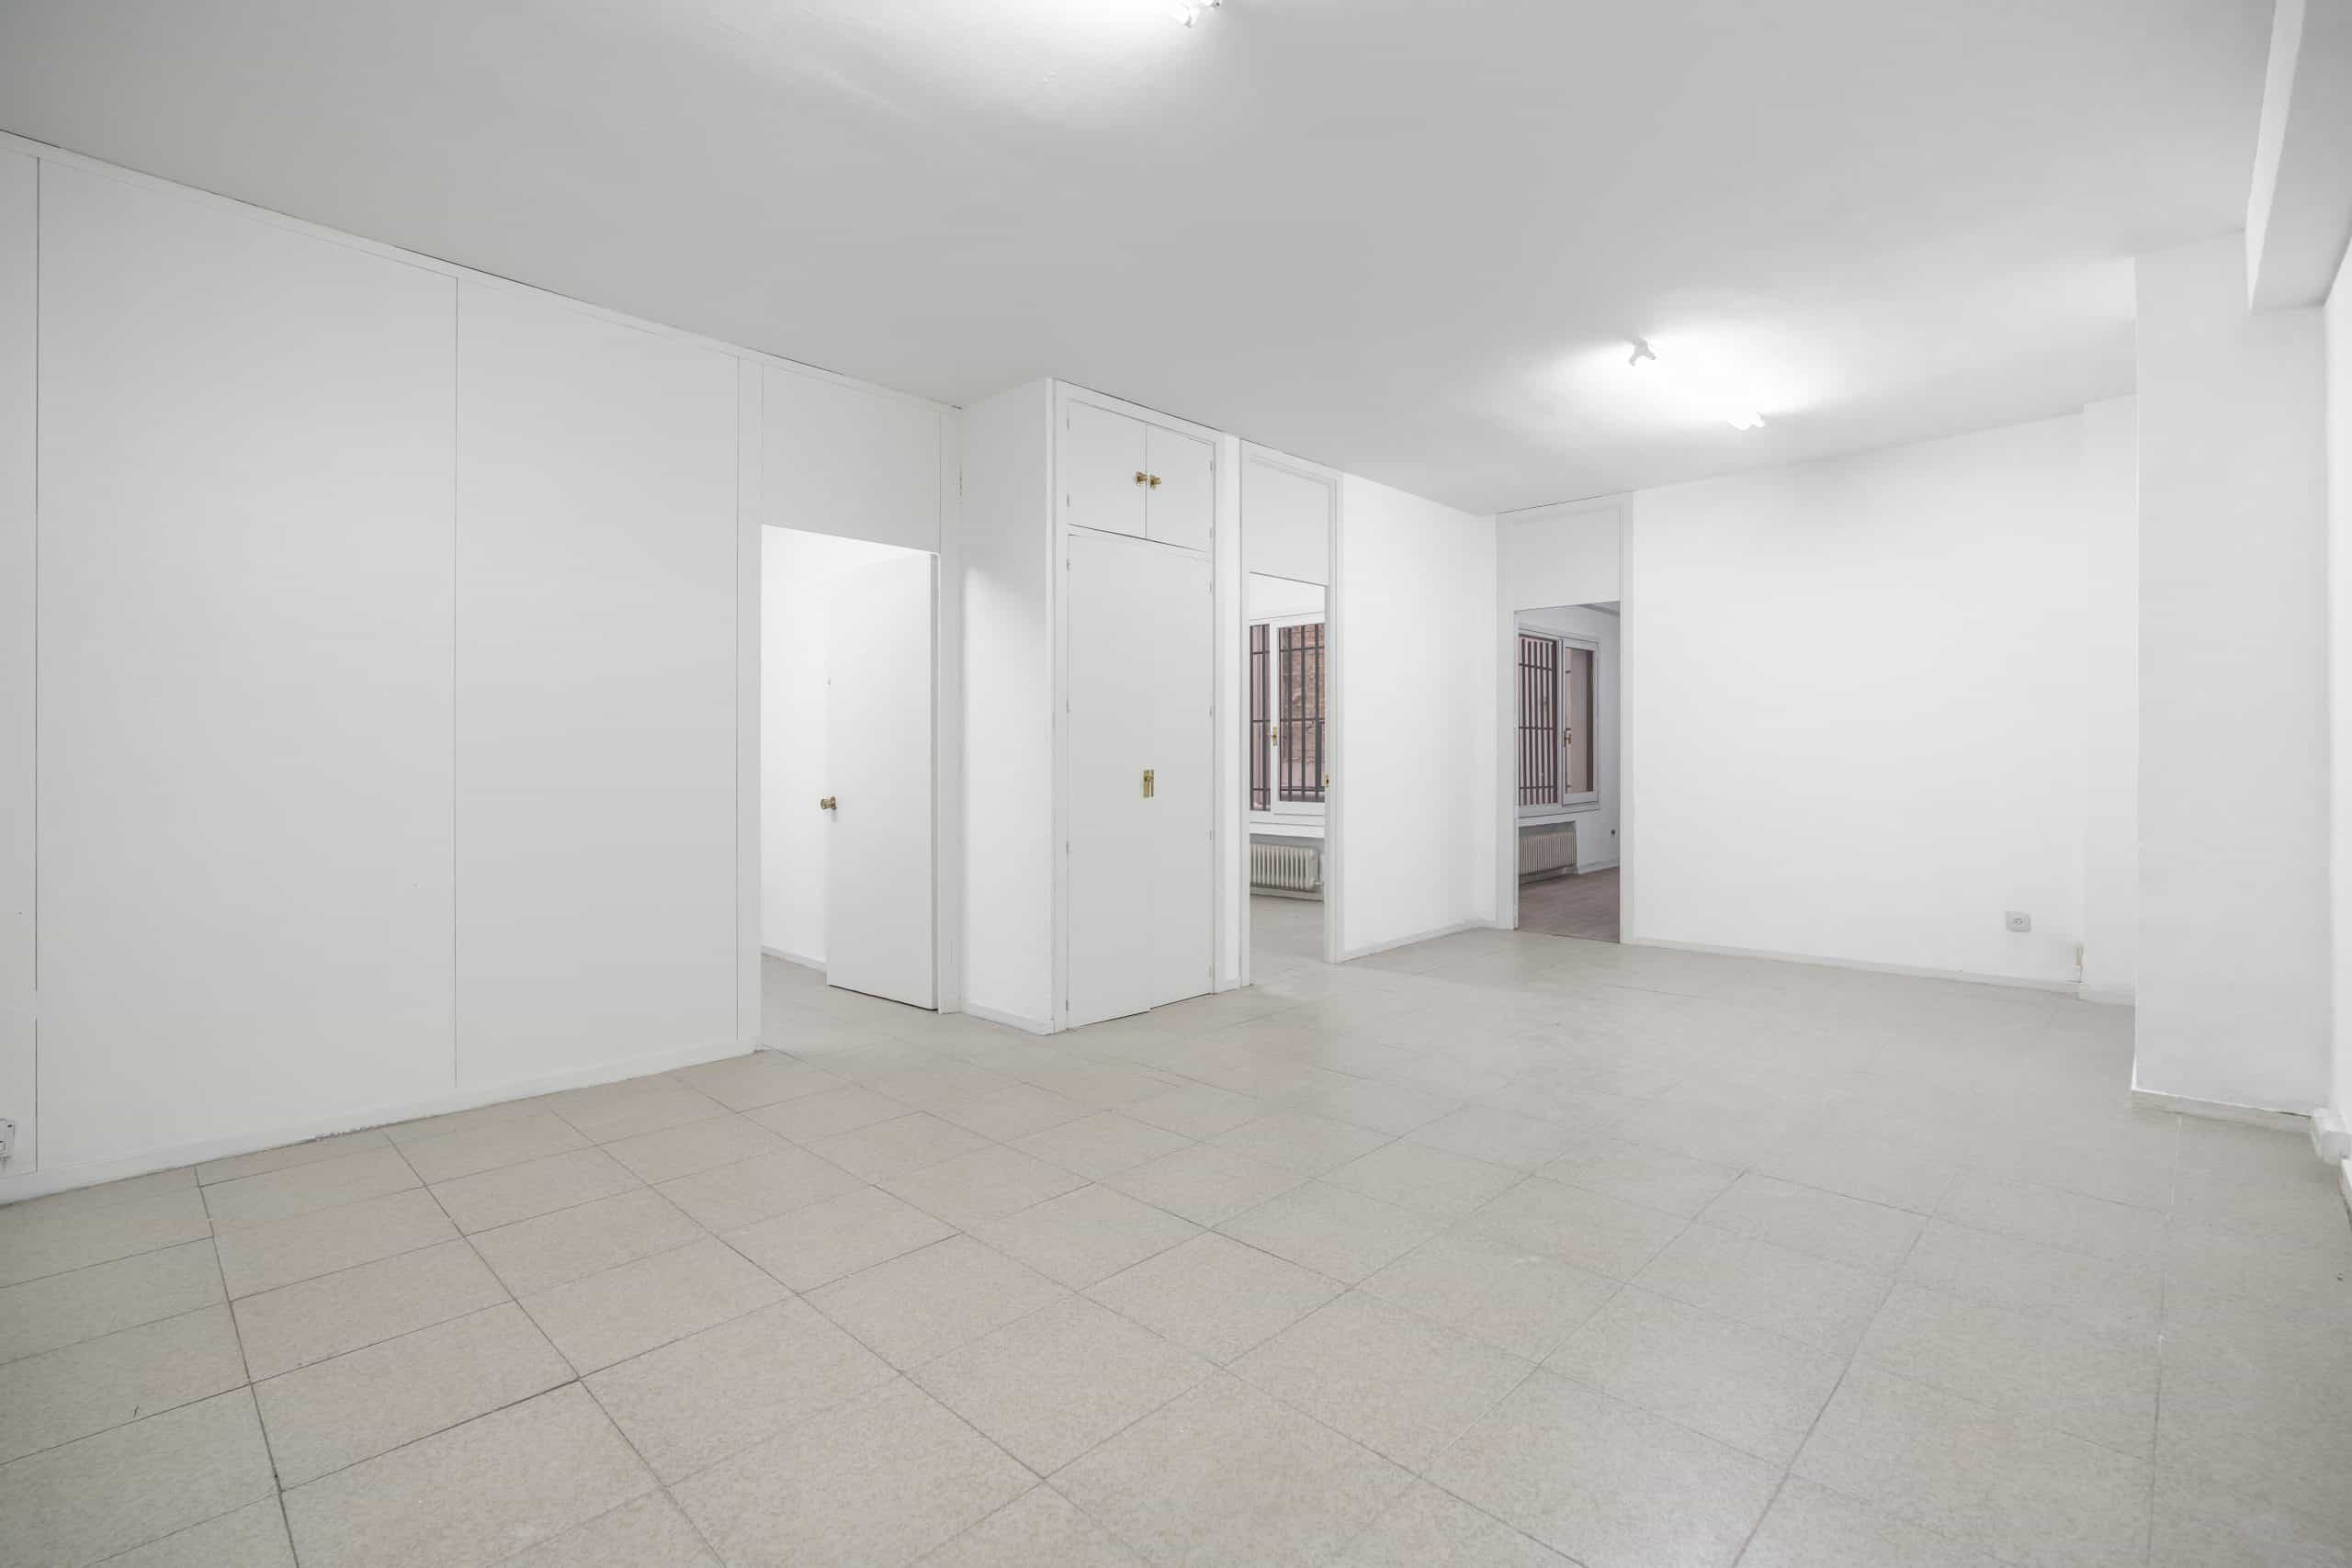 Agencia Inmobiliaria de Madrid-FUTUROCASA-Zona ARGANZUELA-LEGAZPI -calle Modesto Lafuente 41,1ºC estancia 4